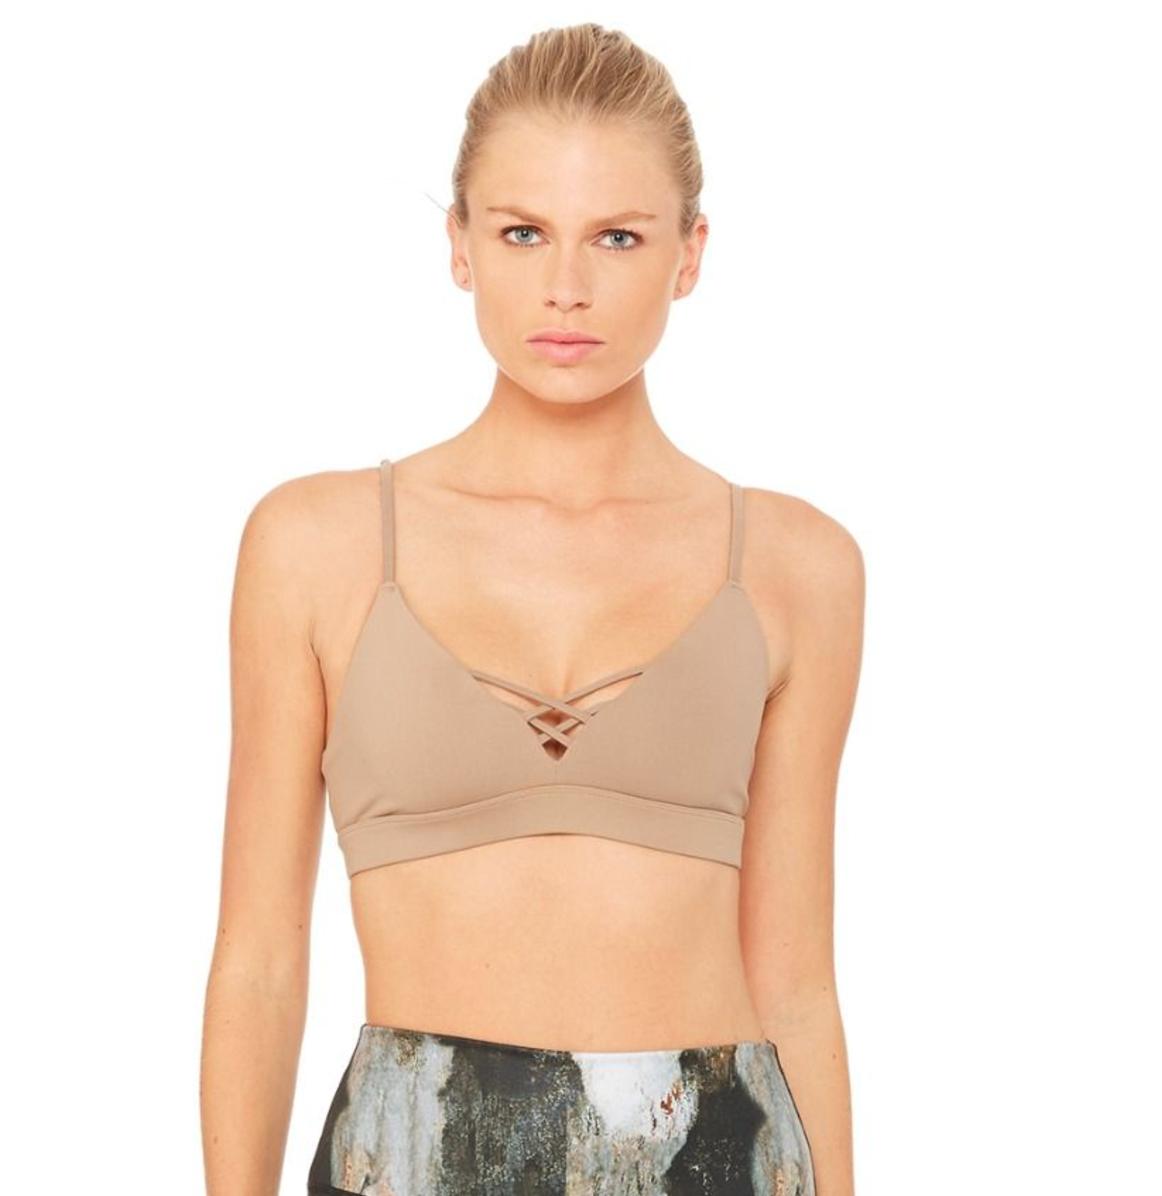 Alo Yoga interlace bra $79